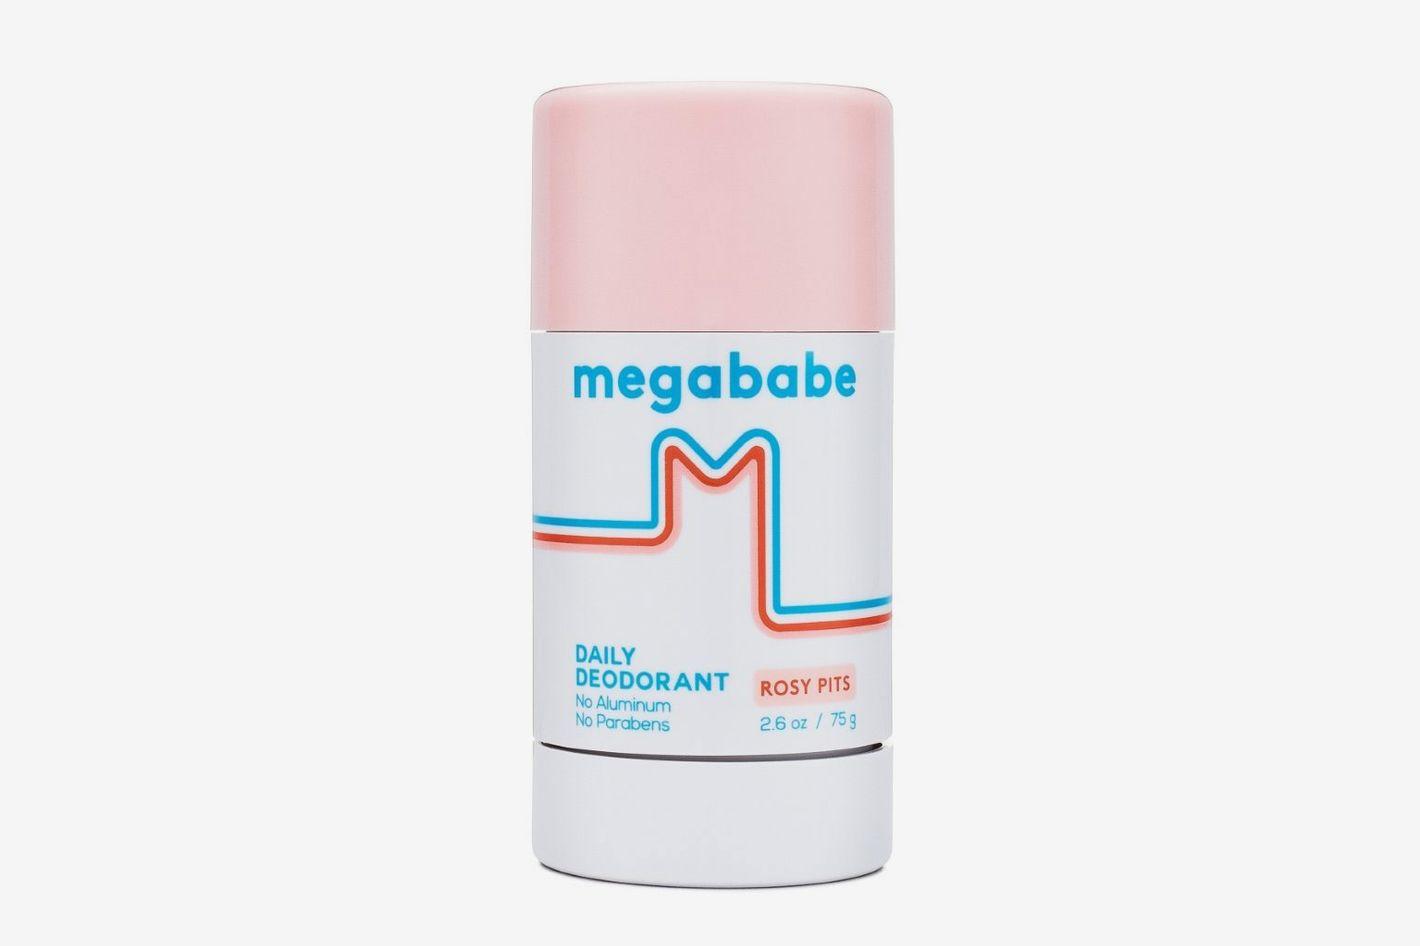 Megababe Rosy Pits